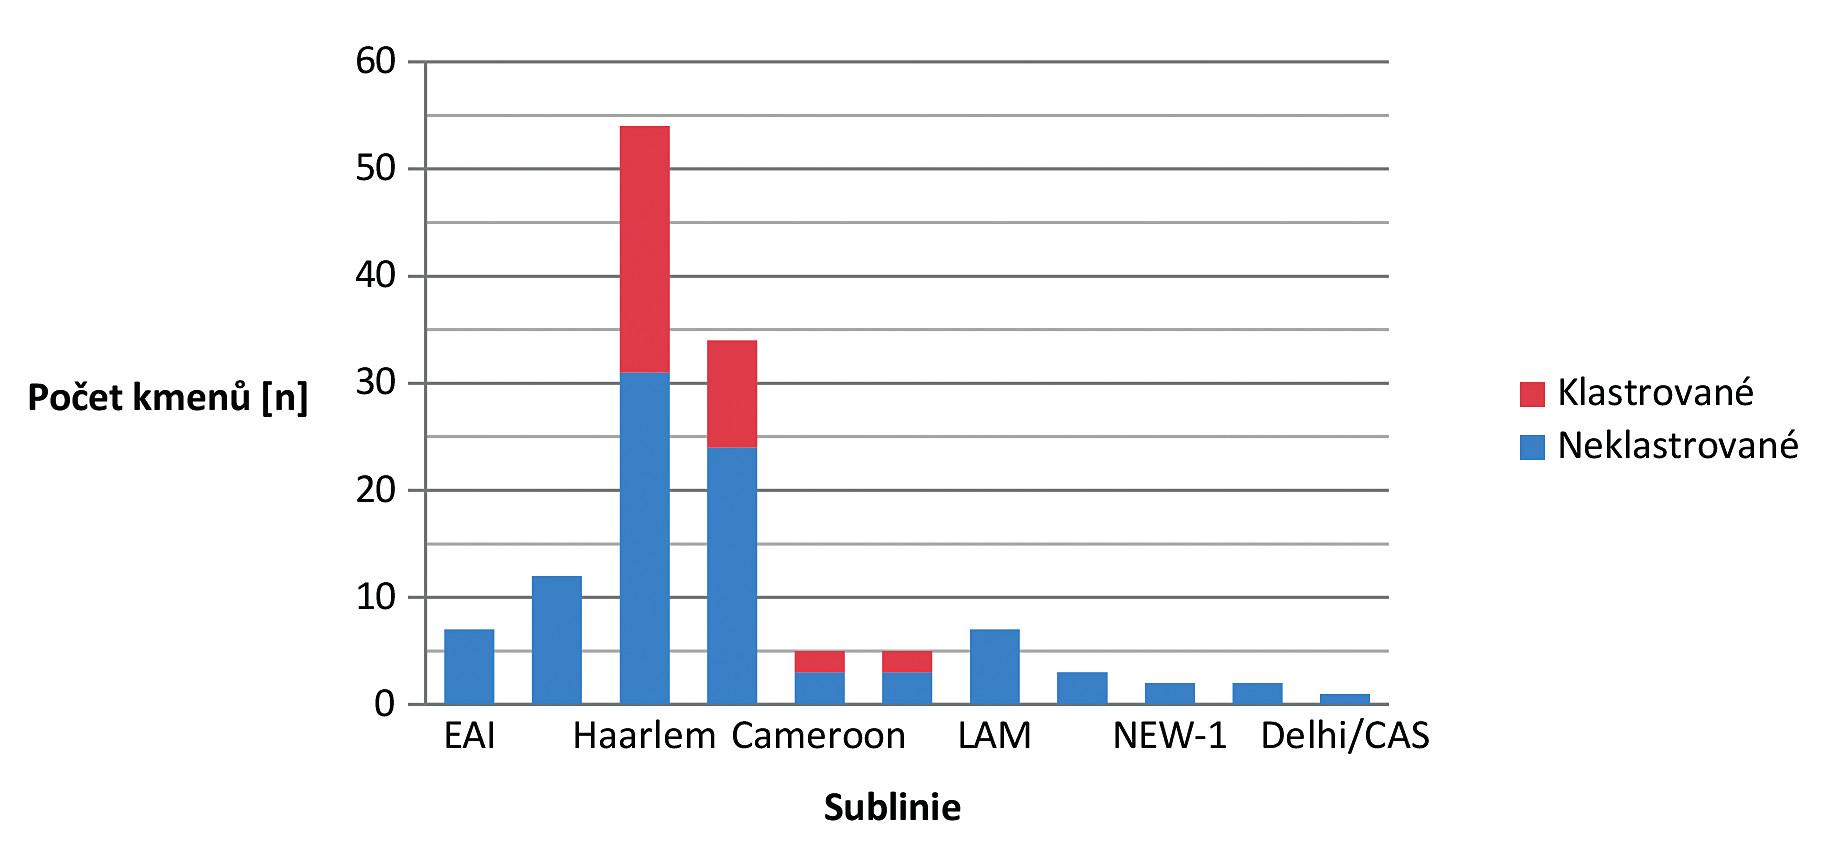 Zastoupení sublinií kmenů <i>M. tuberculosis</i> 2013–2014.<br>Chart 2. Sublineage distribution of <i>M. tuberculosis</i> strains, 2013–2014